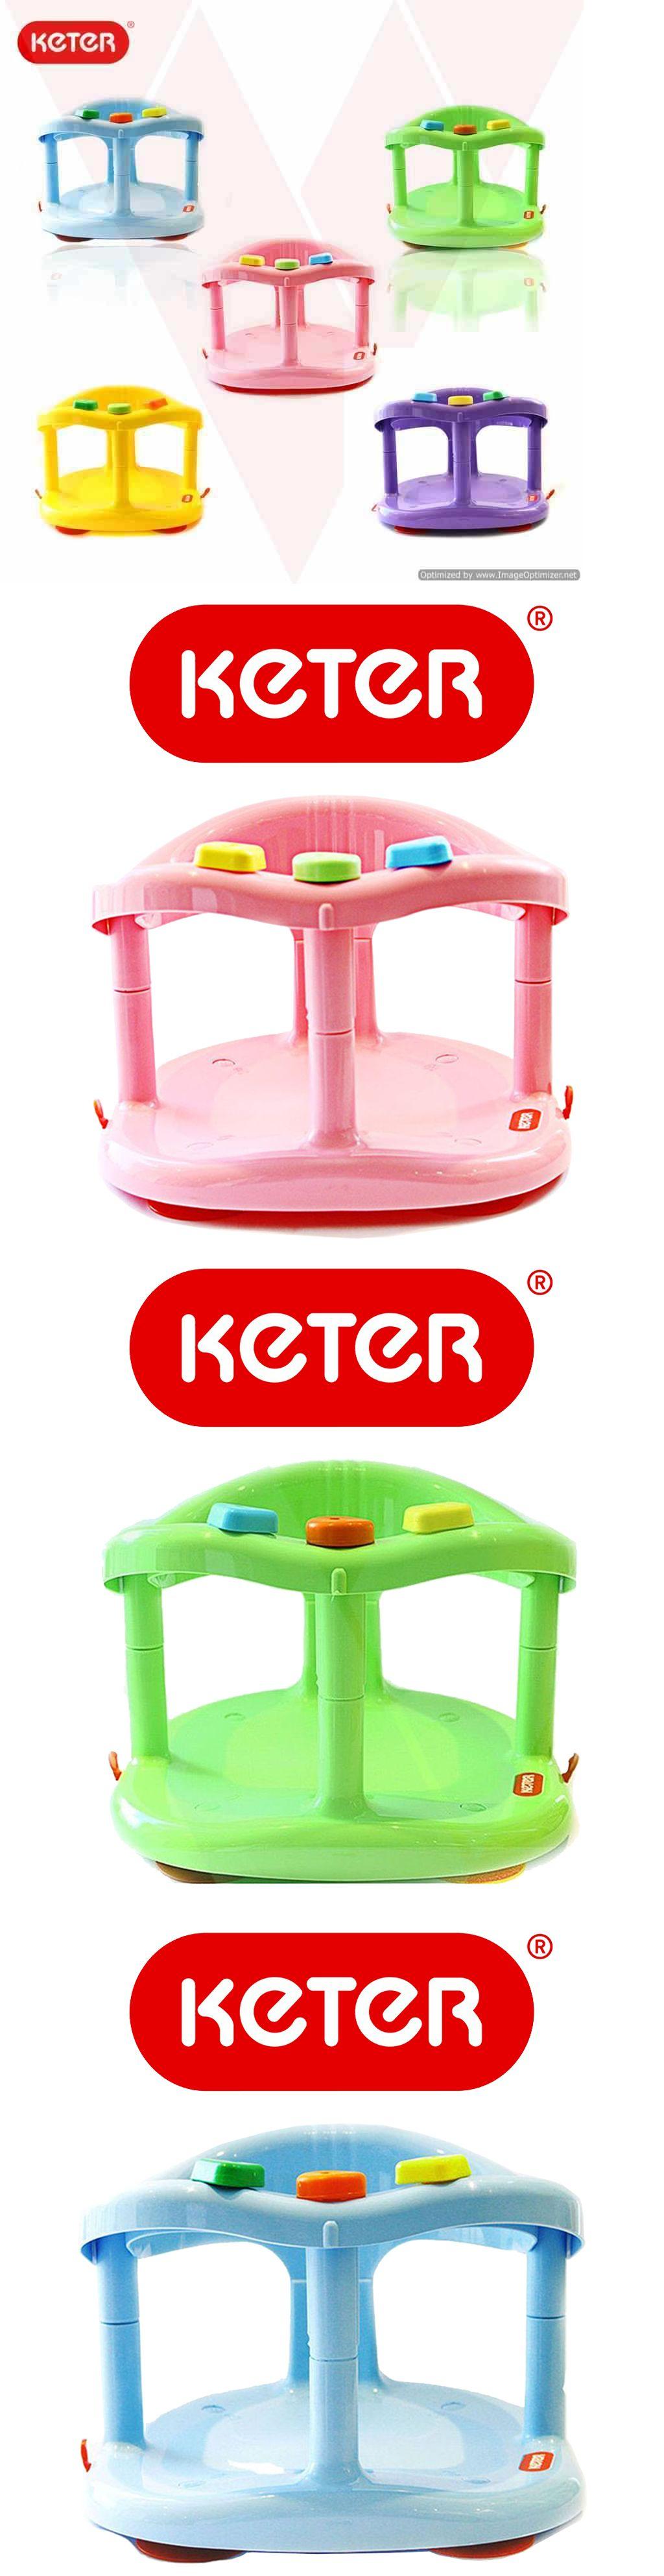 Bath Tub Seats and Rings 162024: Keter - Baby Bath Tub Ring Seat ...